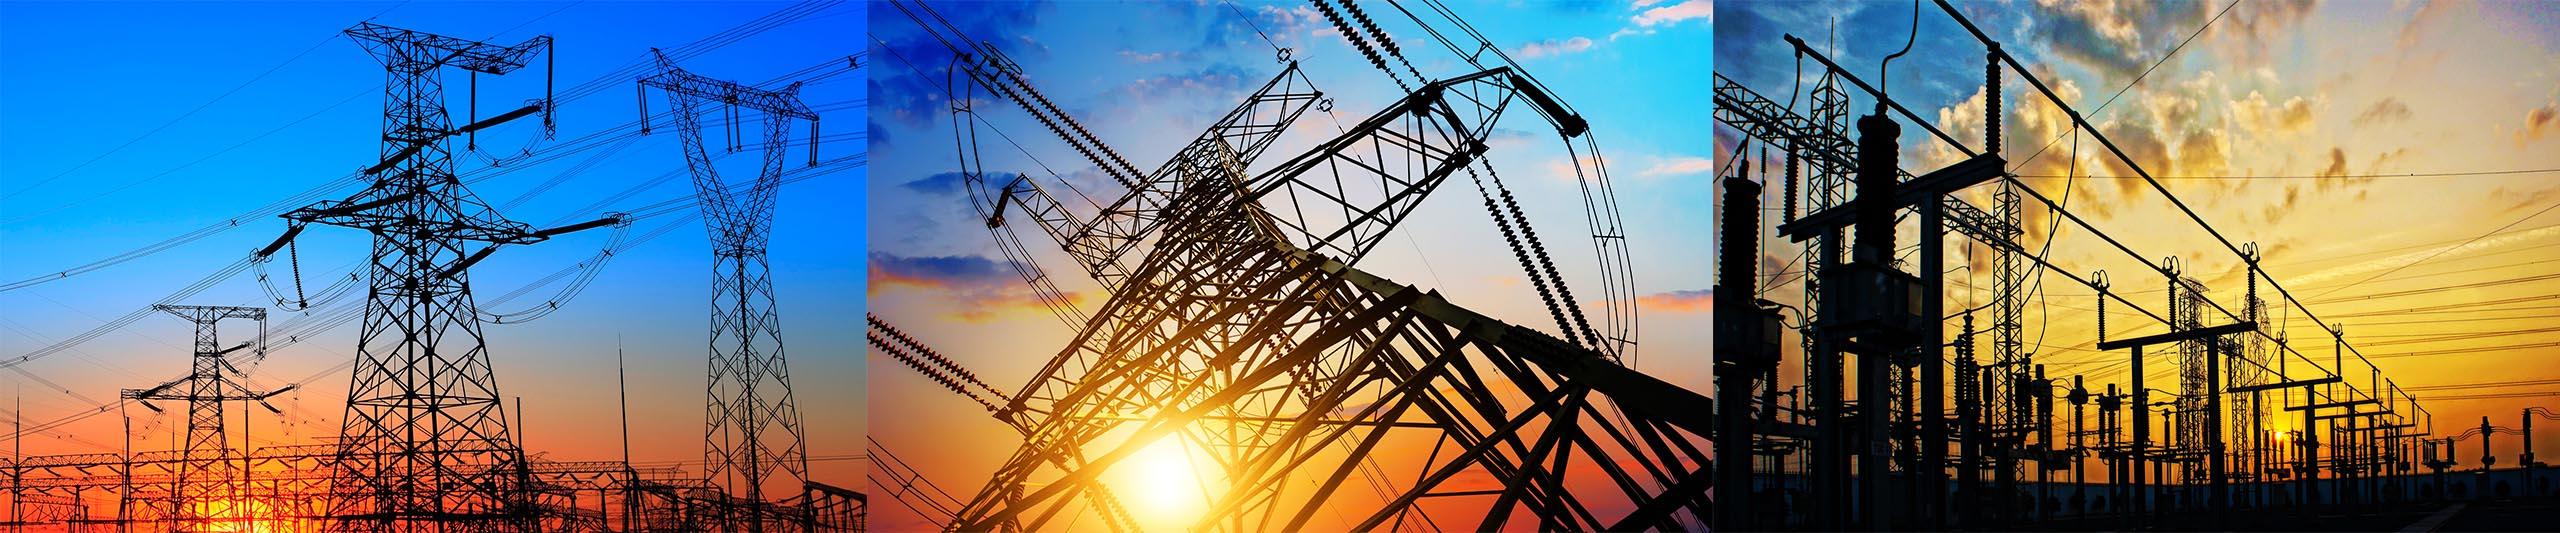 POWER CONSTRUCTION TOOLS